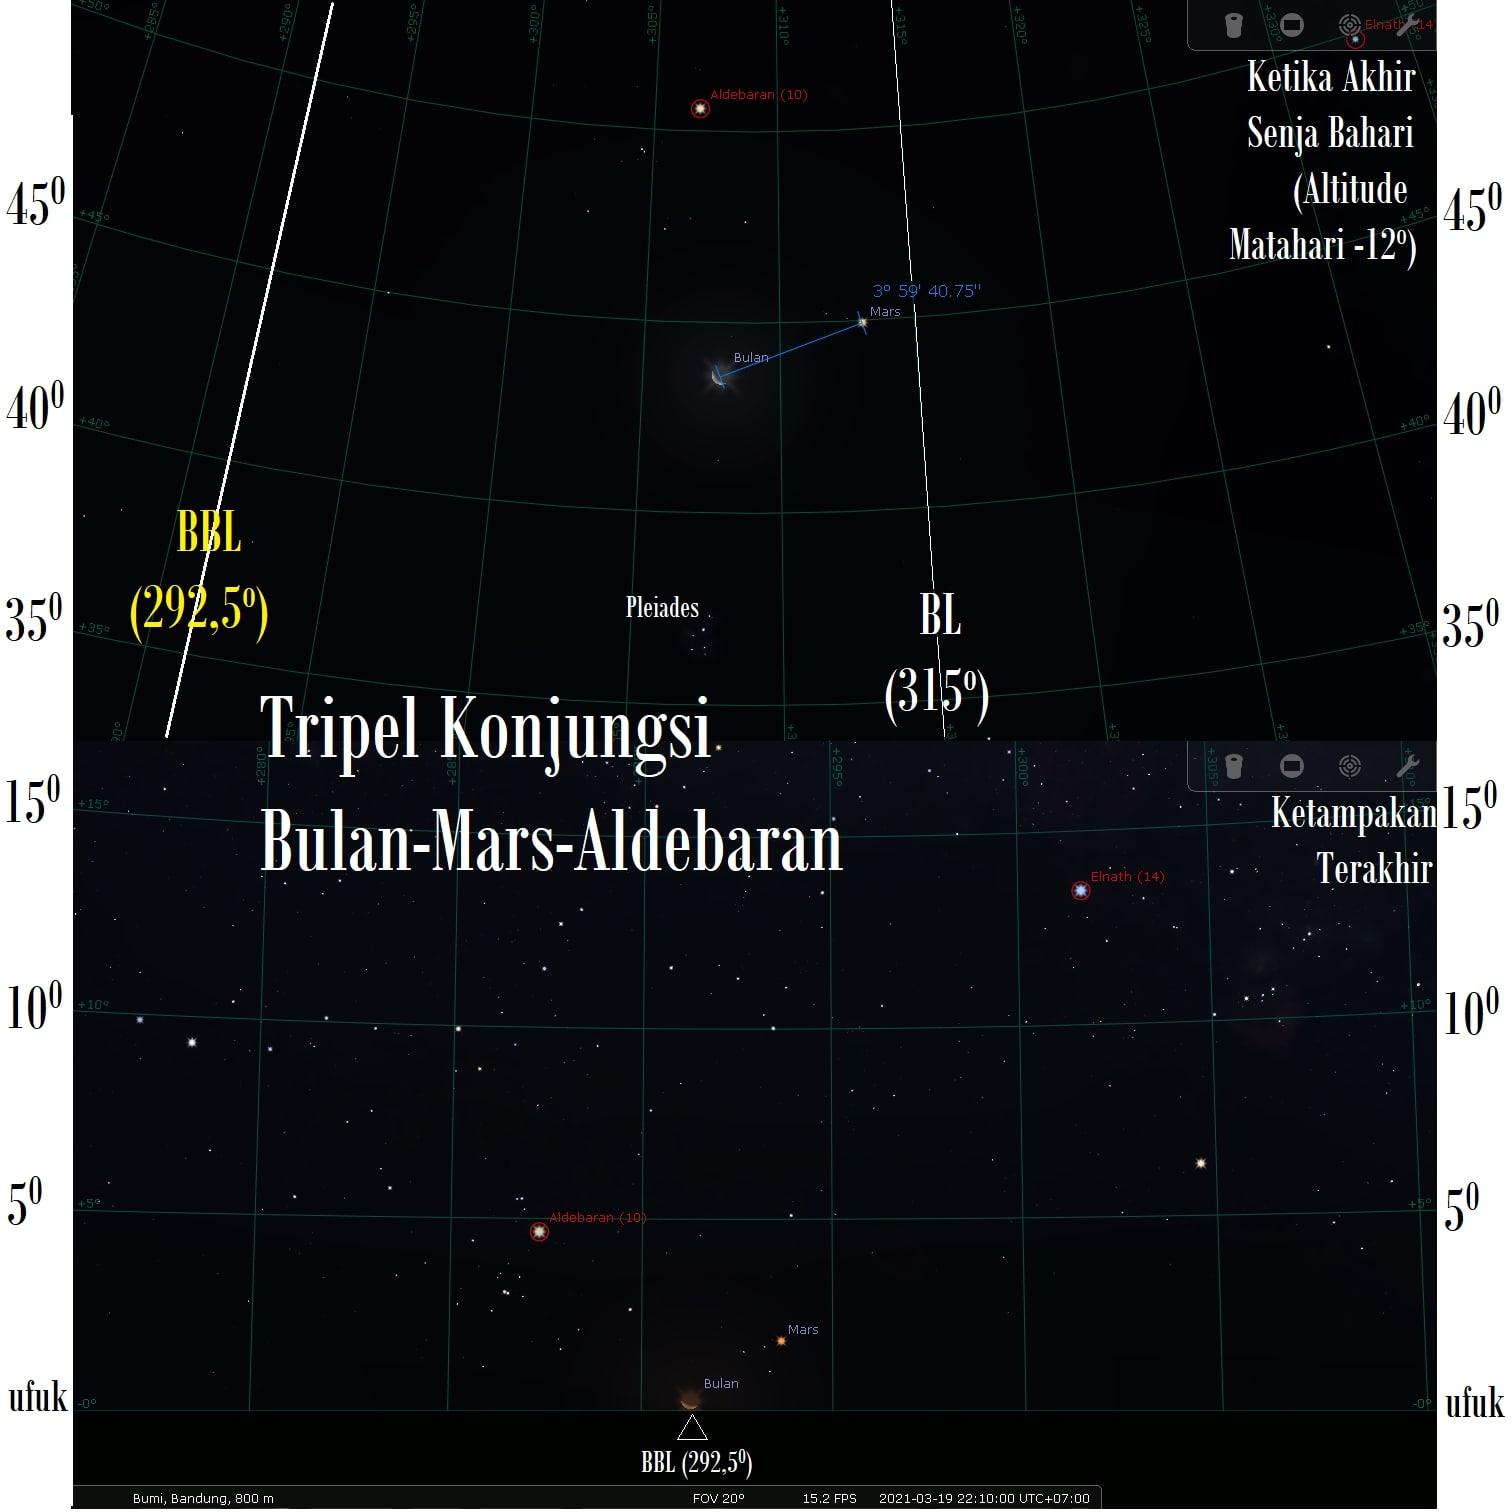 Tripel Konjungsi Bulan - Mars - Aldebaran